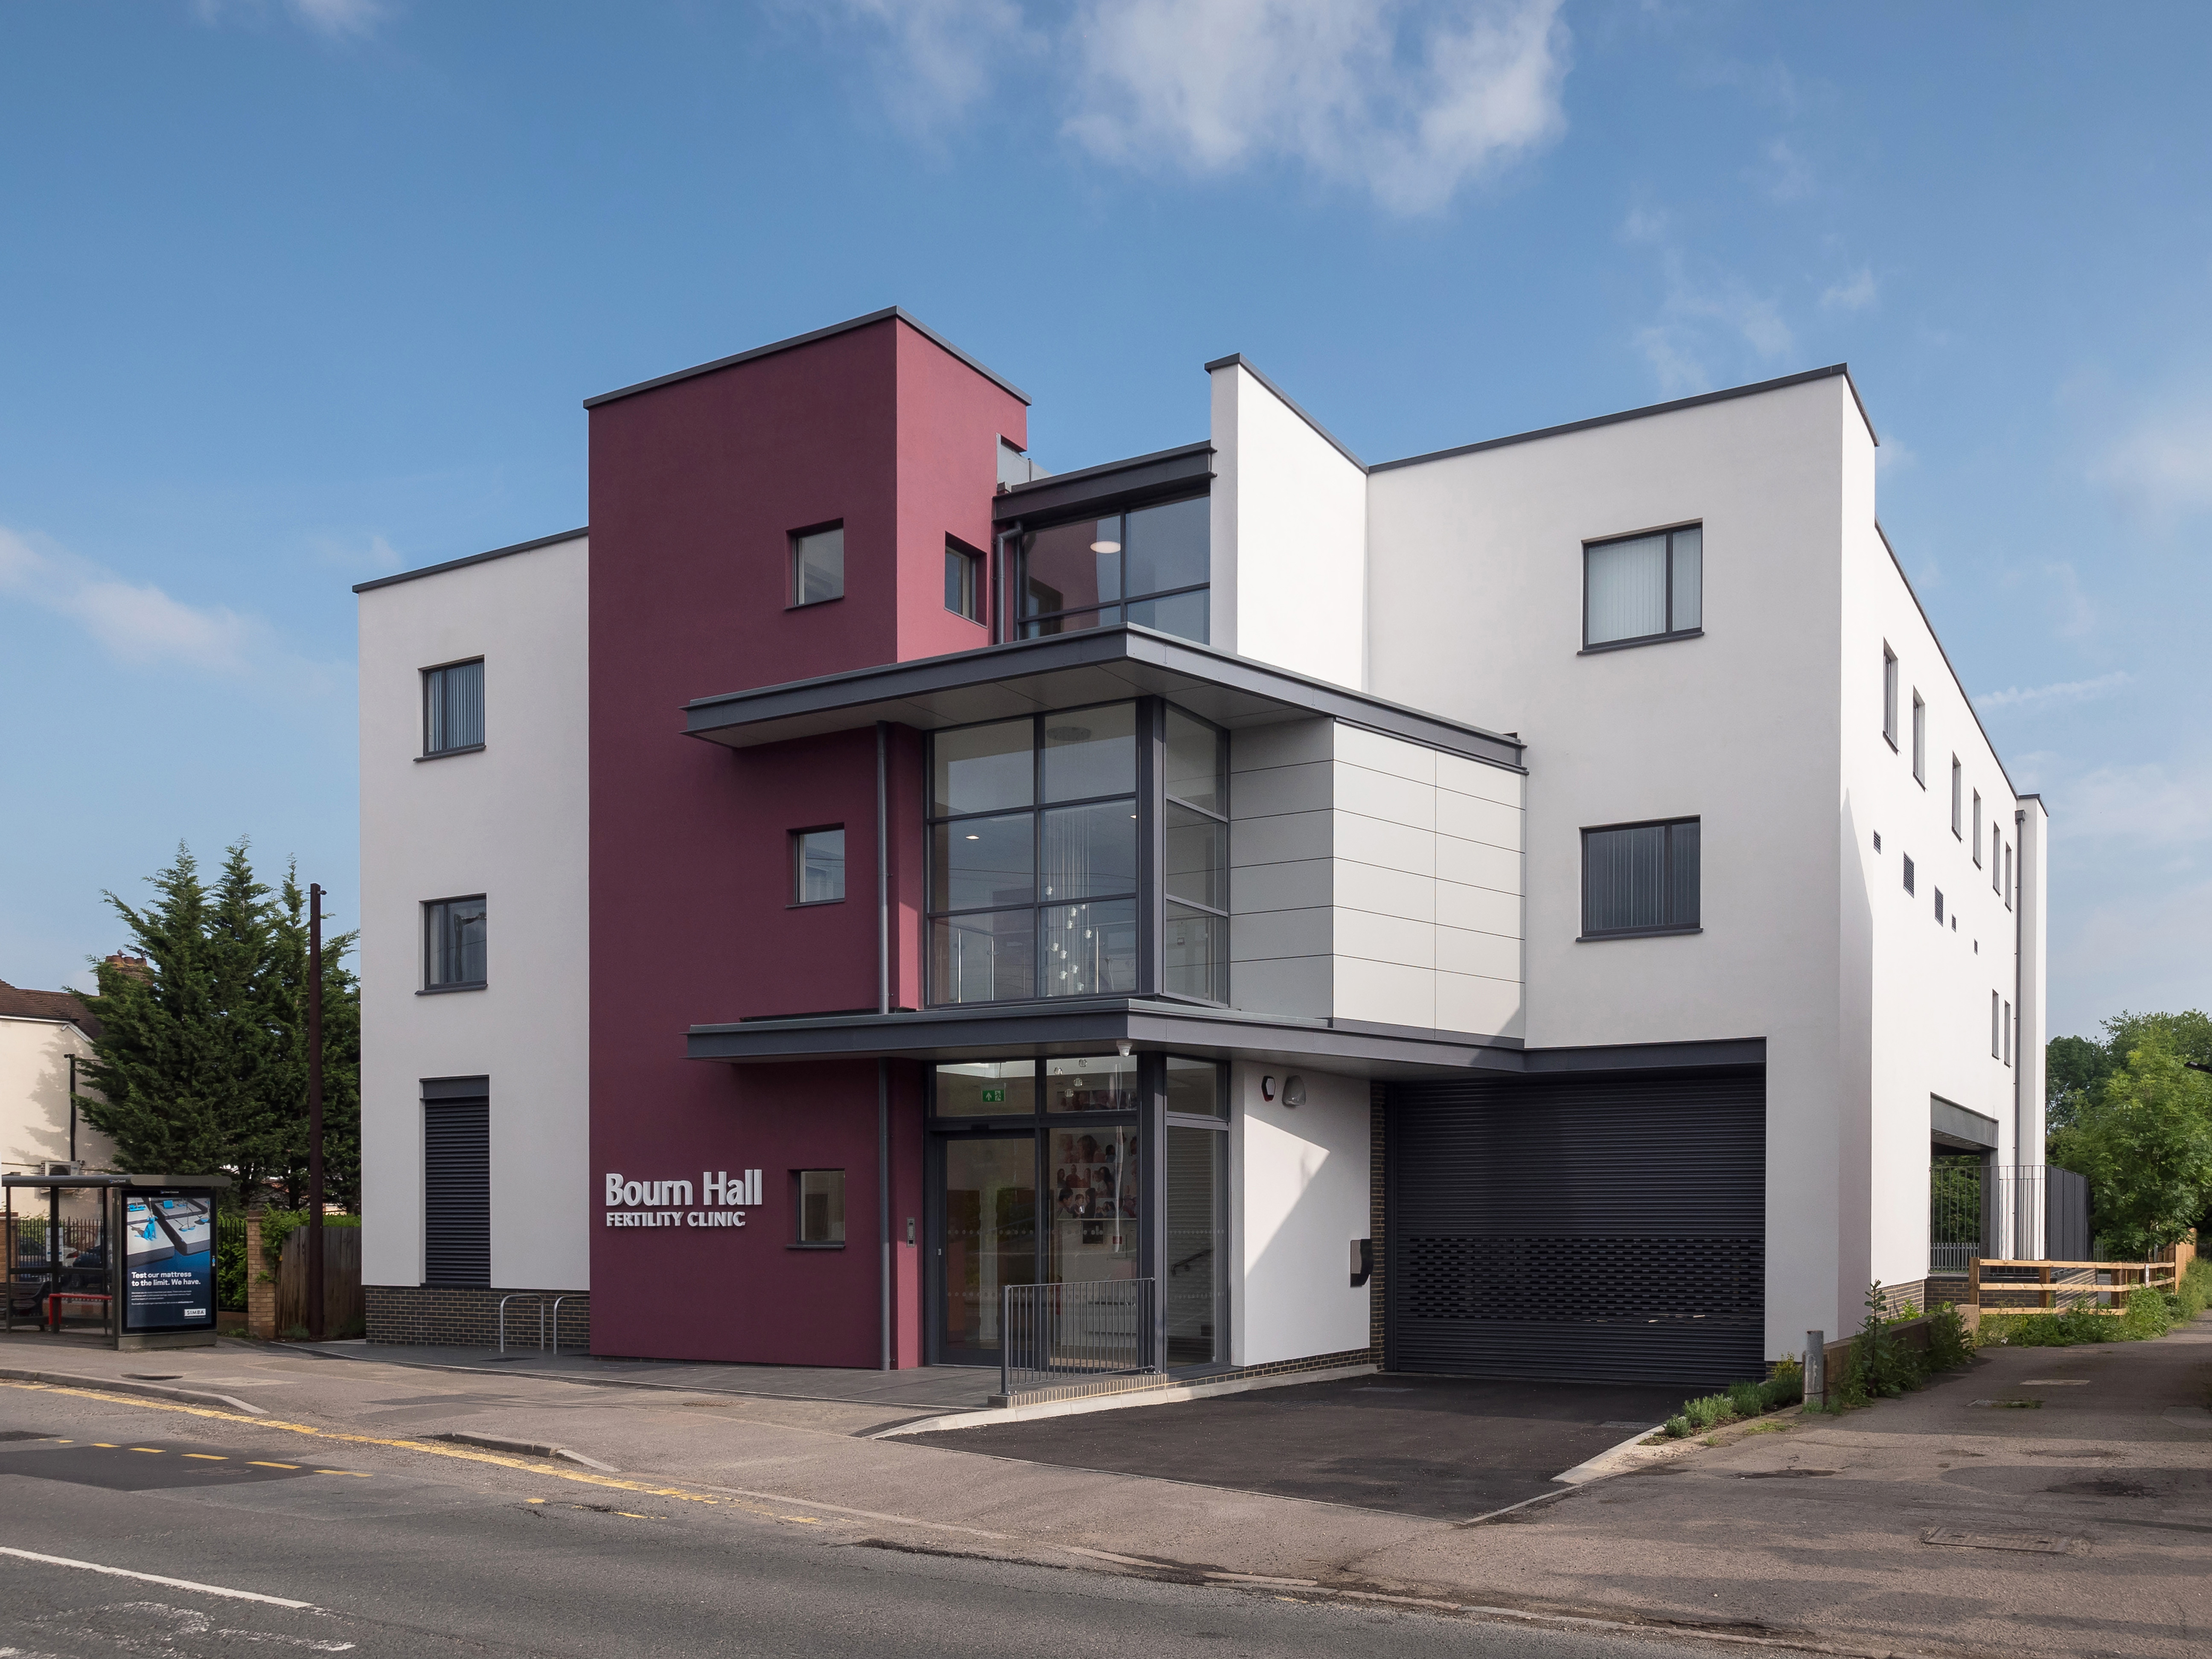 Bourn Hall Clinic Wickford